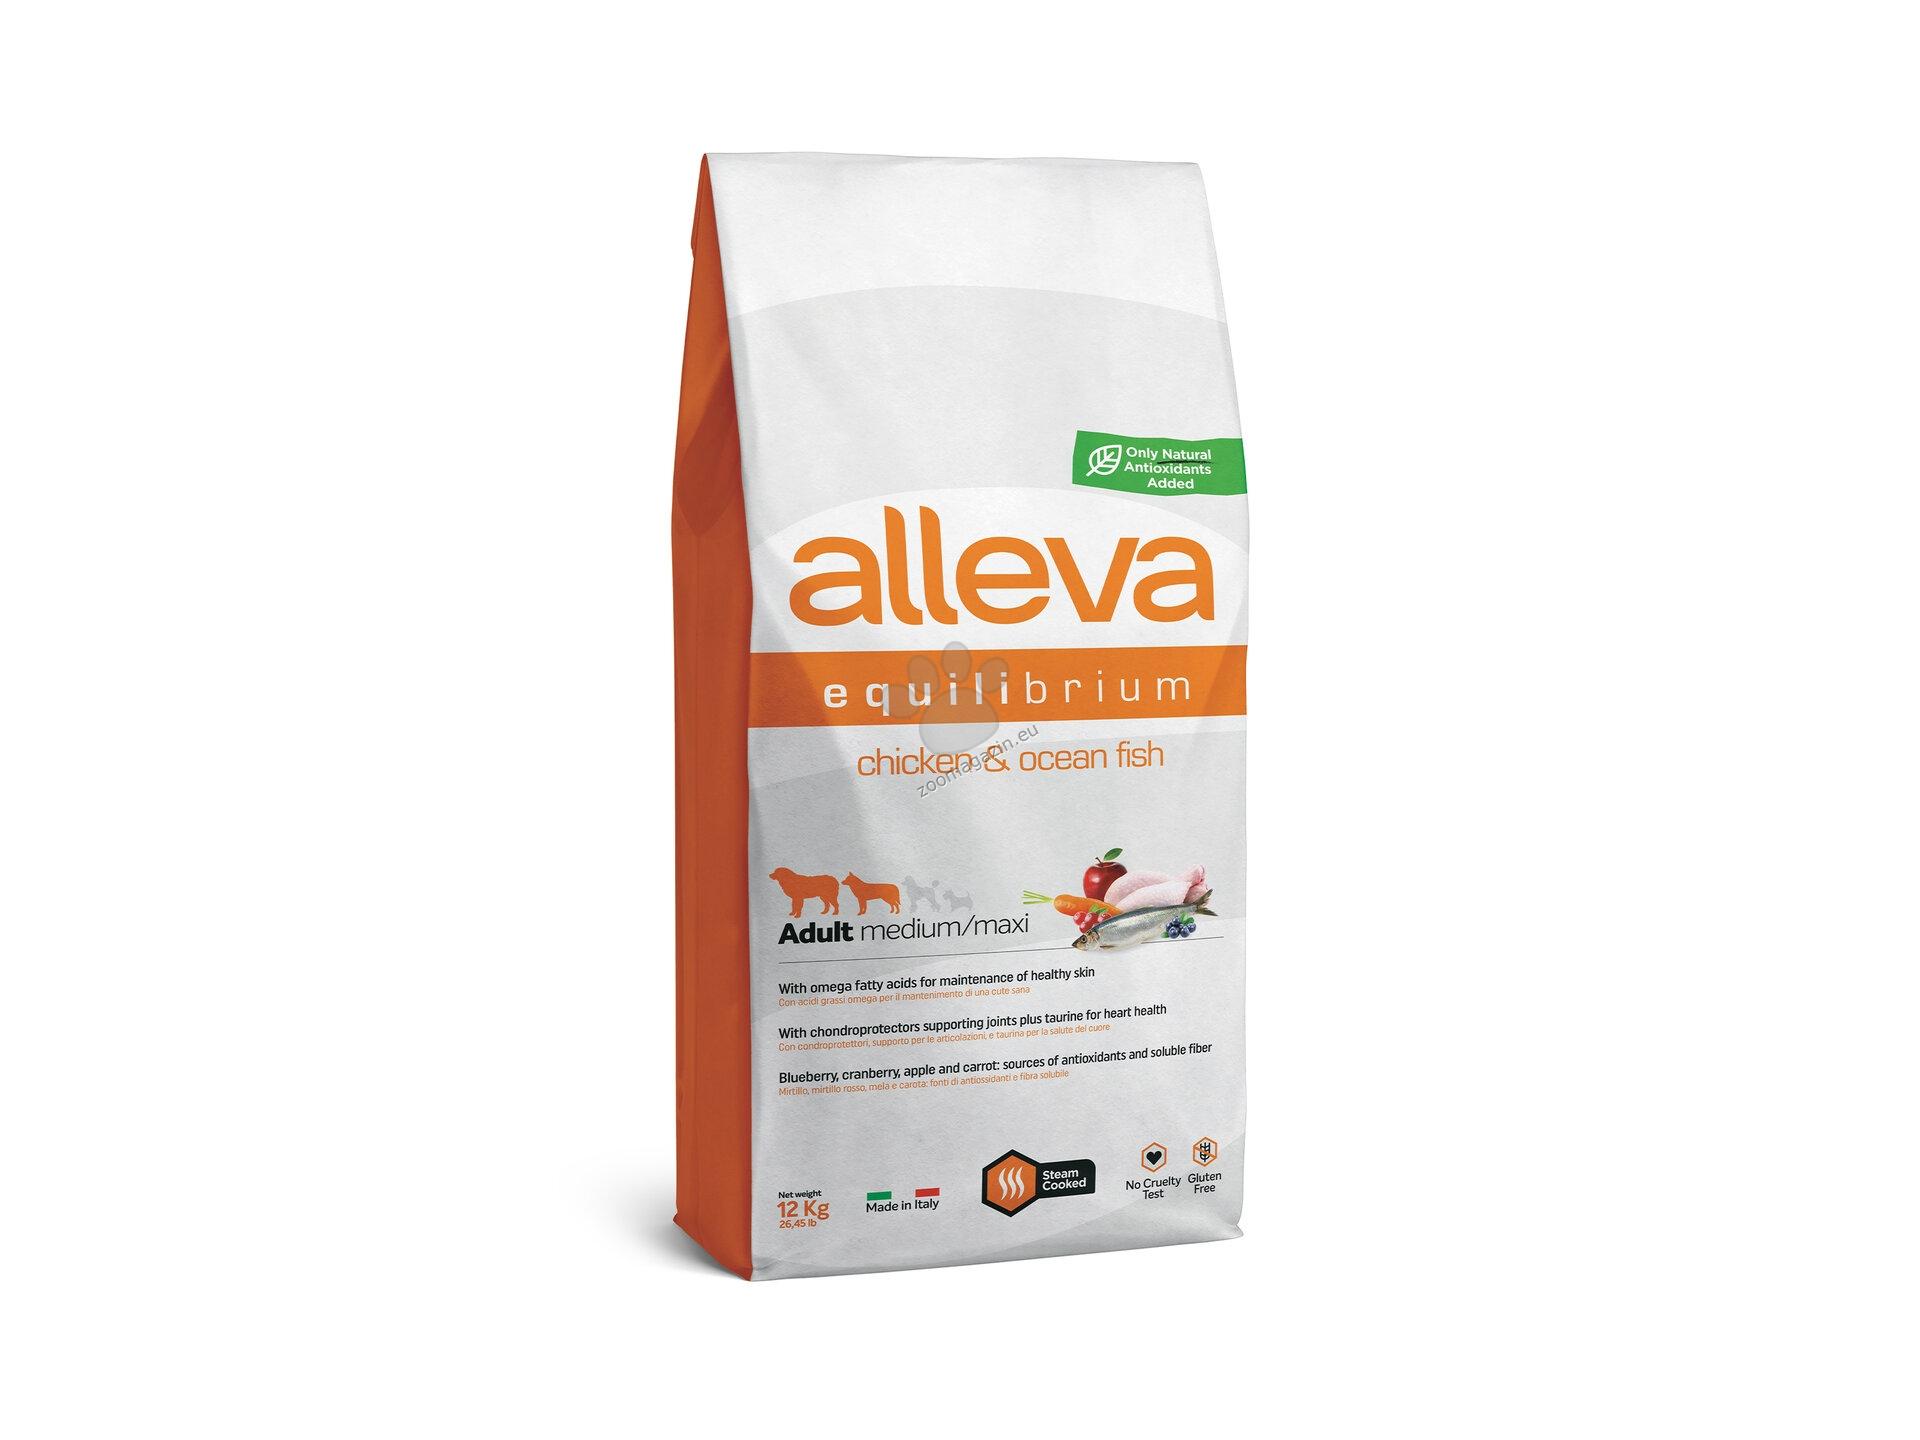 Alleva Equilibrium All Day Maintenance Chicken & Ocean Fish Adult Medium/Maxi - с пилешко и океанска риба, за кучета средни /10-25 кг. / и големи / над 25 кг. / породи и възраст над 12 месеца 2 кг.